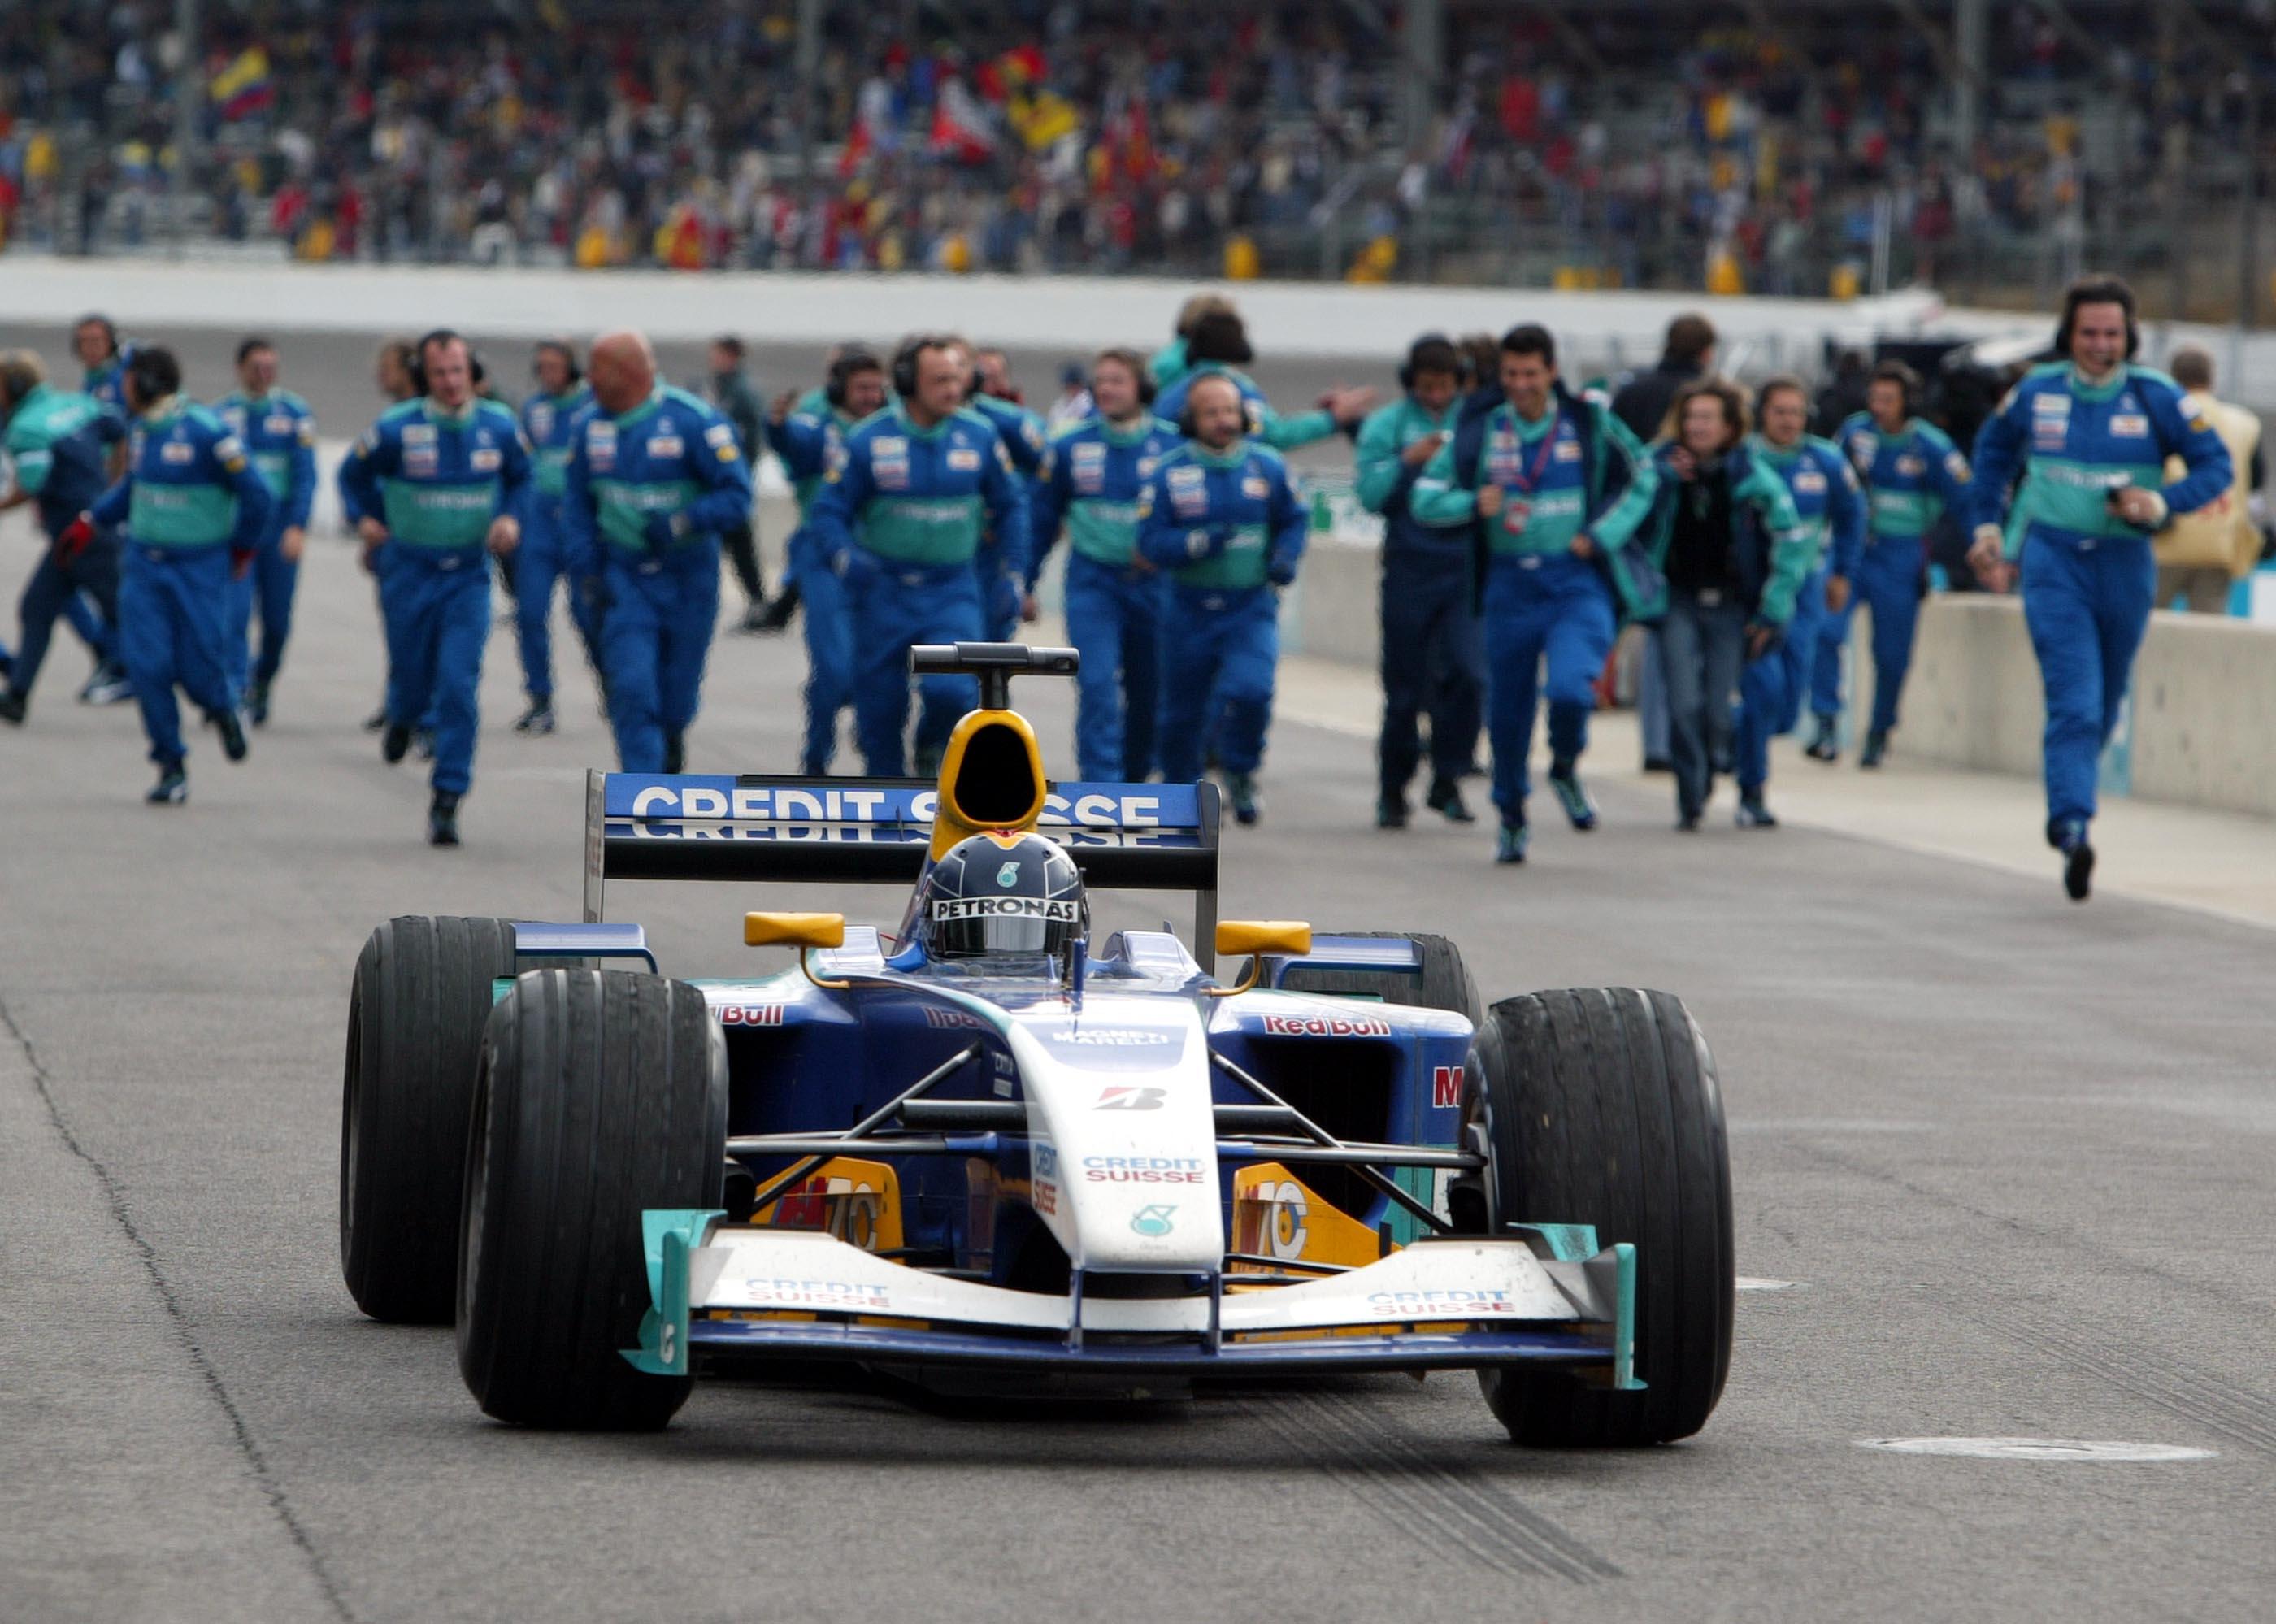 F1, Usa, Indy, Park Ferme, So....